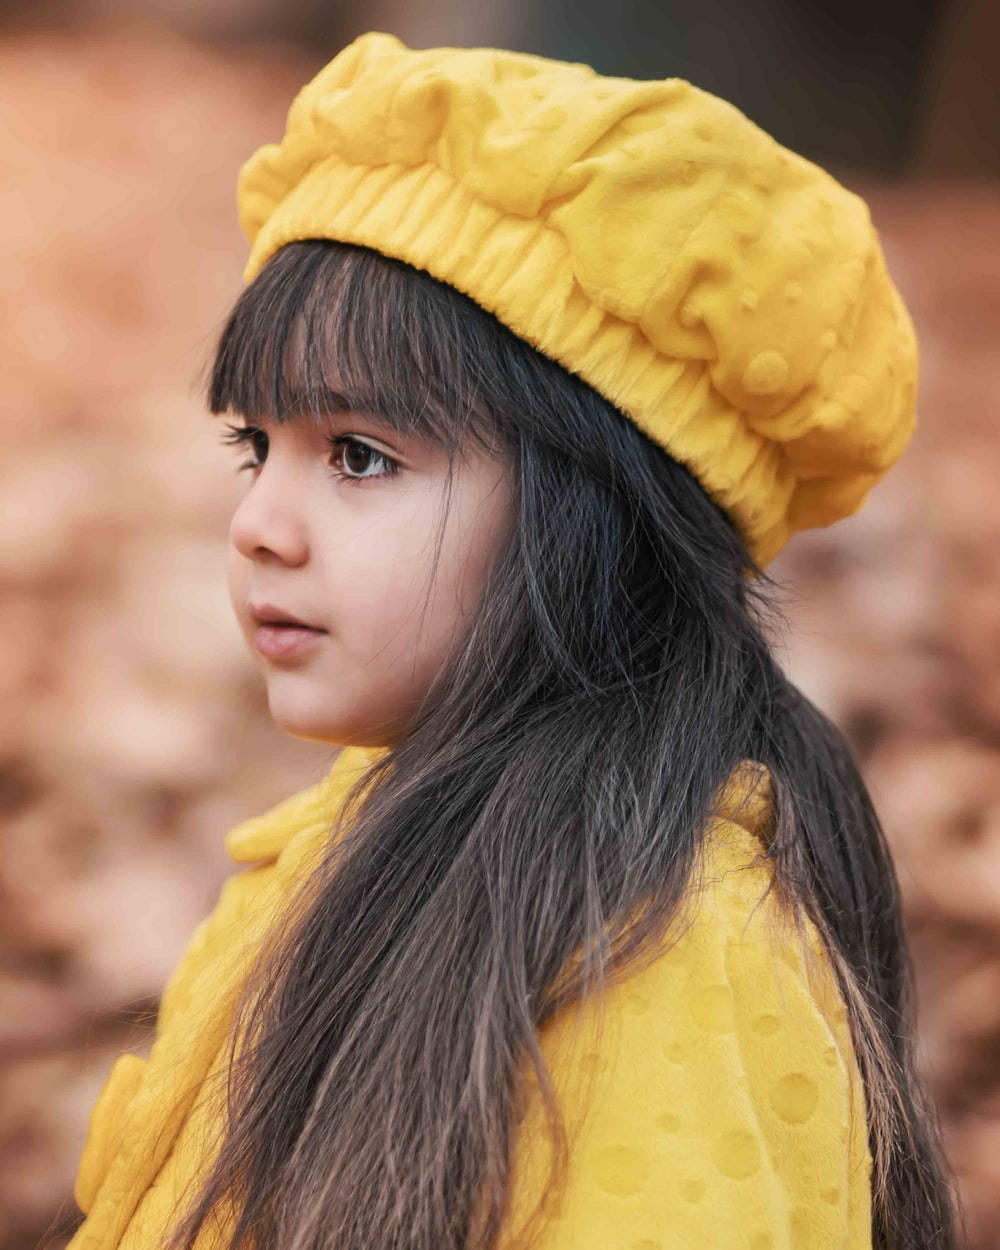 girl wearing yellow hat and yellow dress